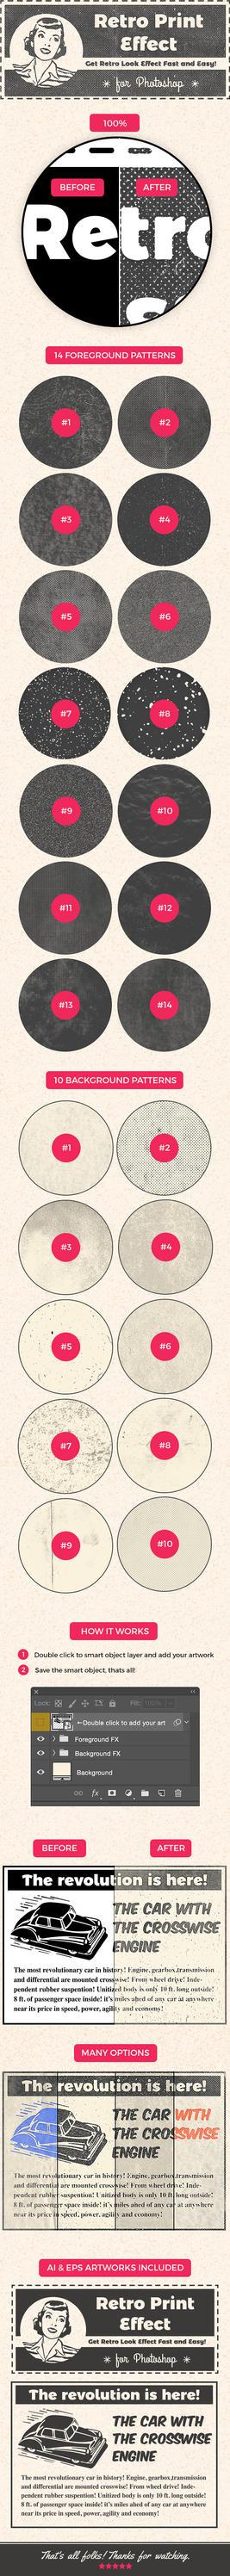 Retro Print Effect by ottoson